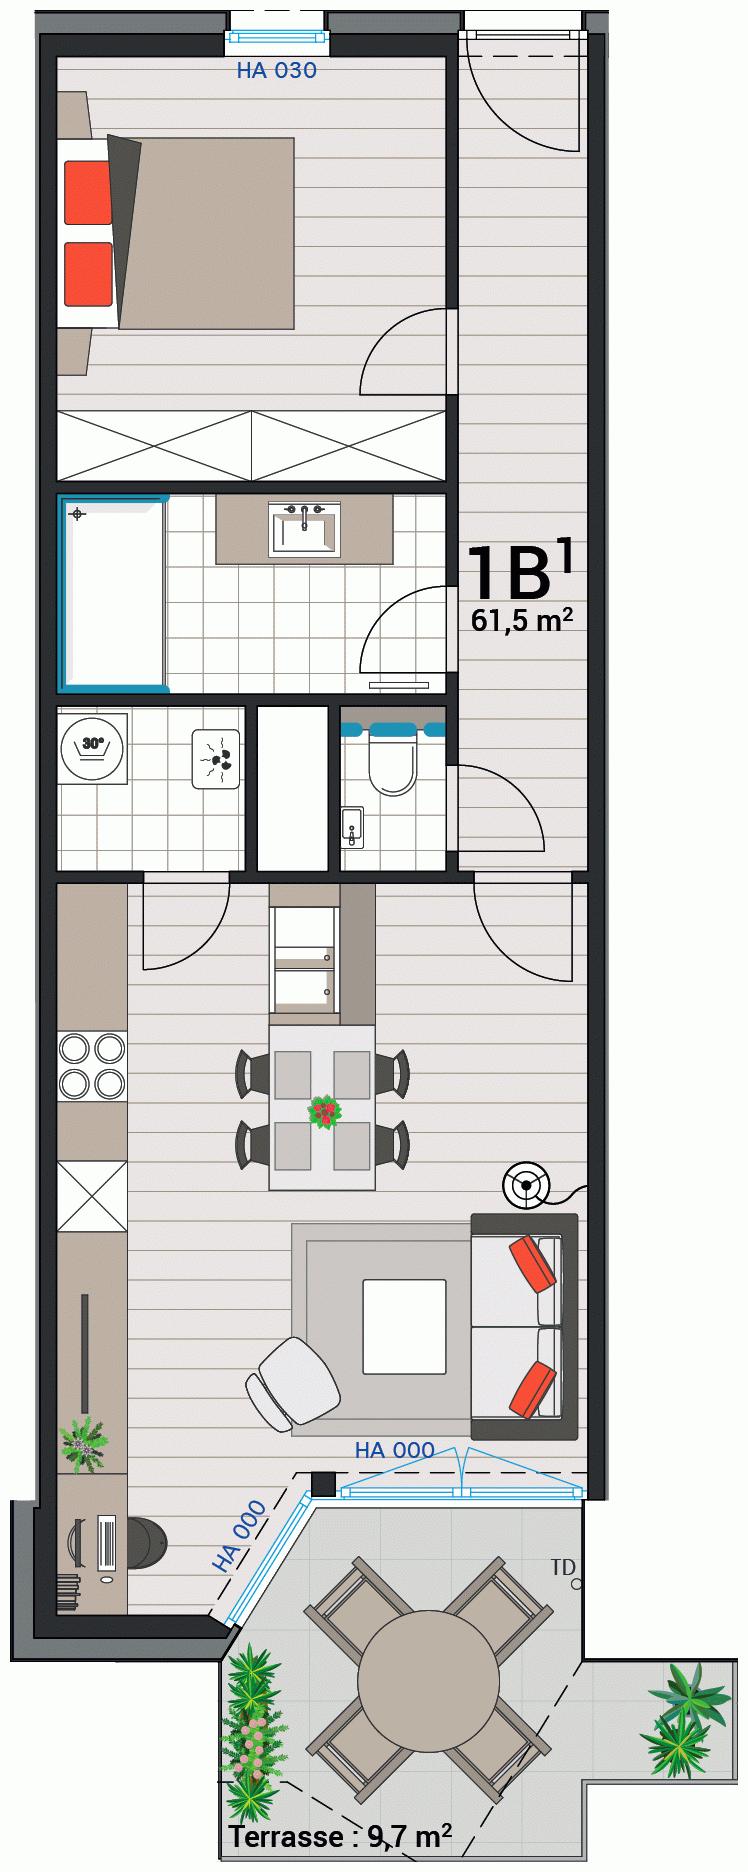 Wohnung 1B